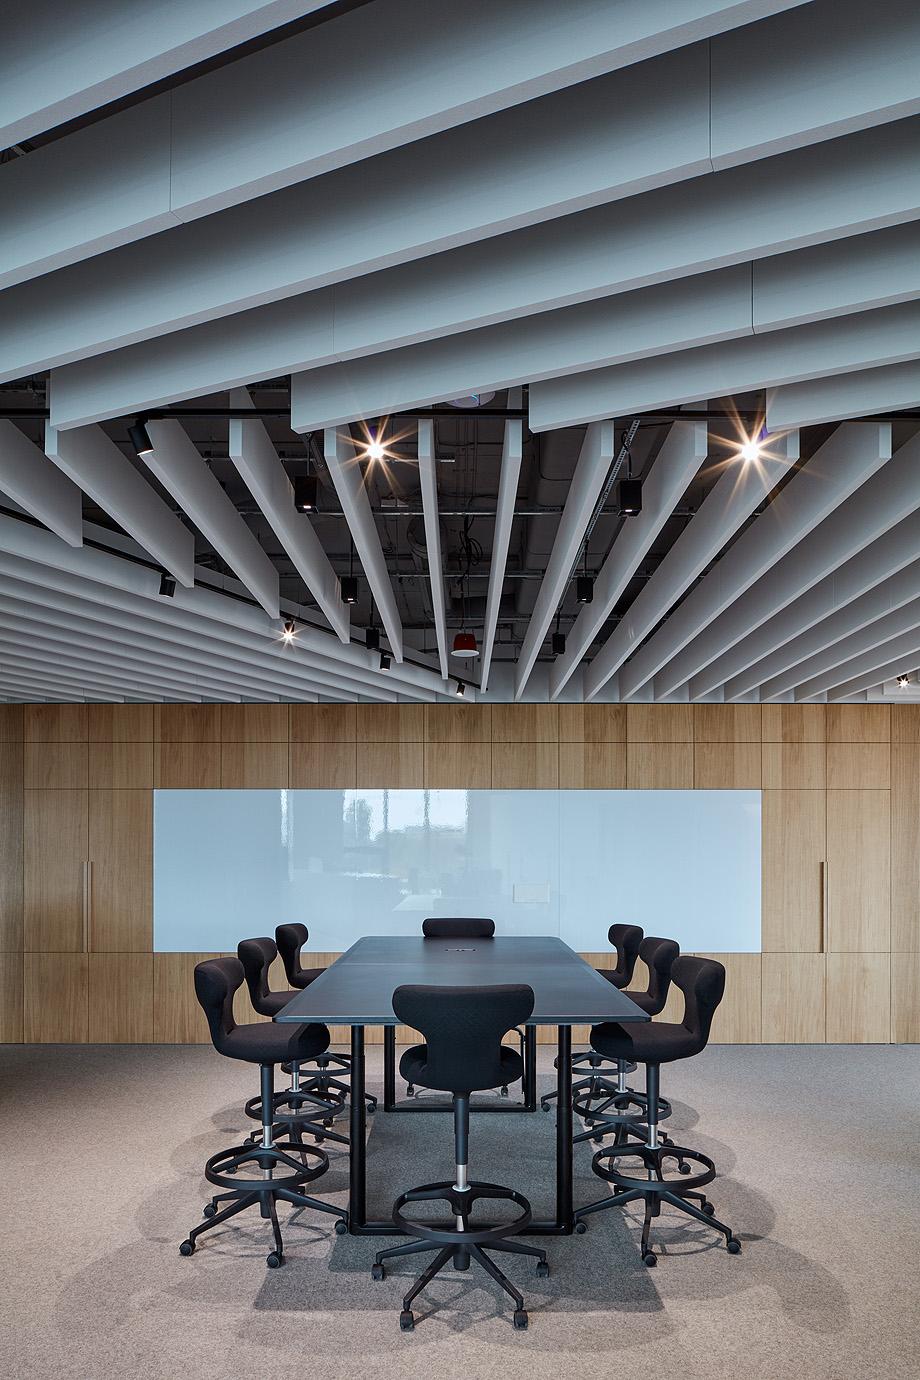 oficinas lucron de cechvala architects - foto boysplaynice (23)